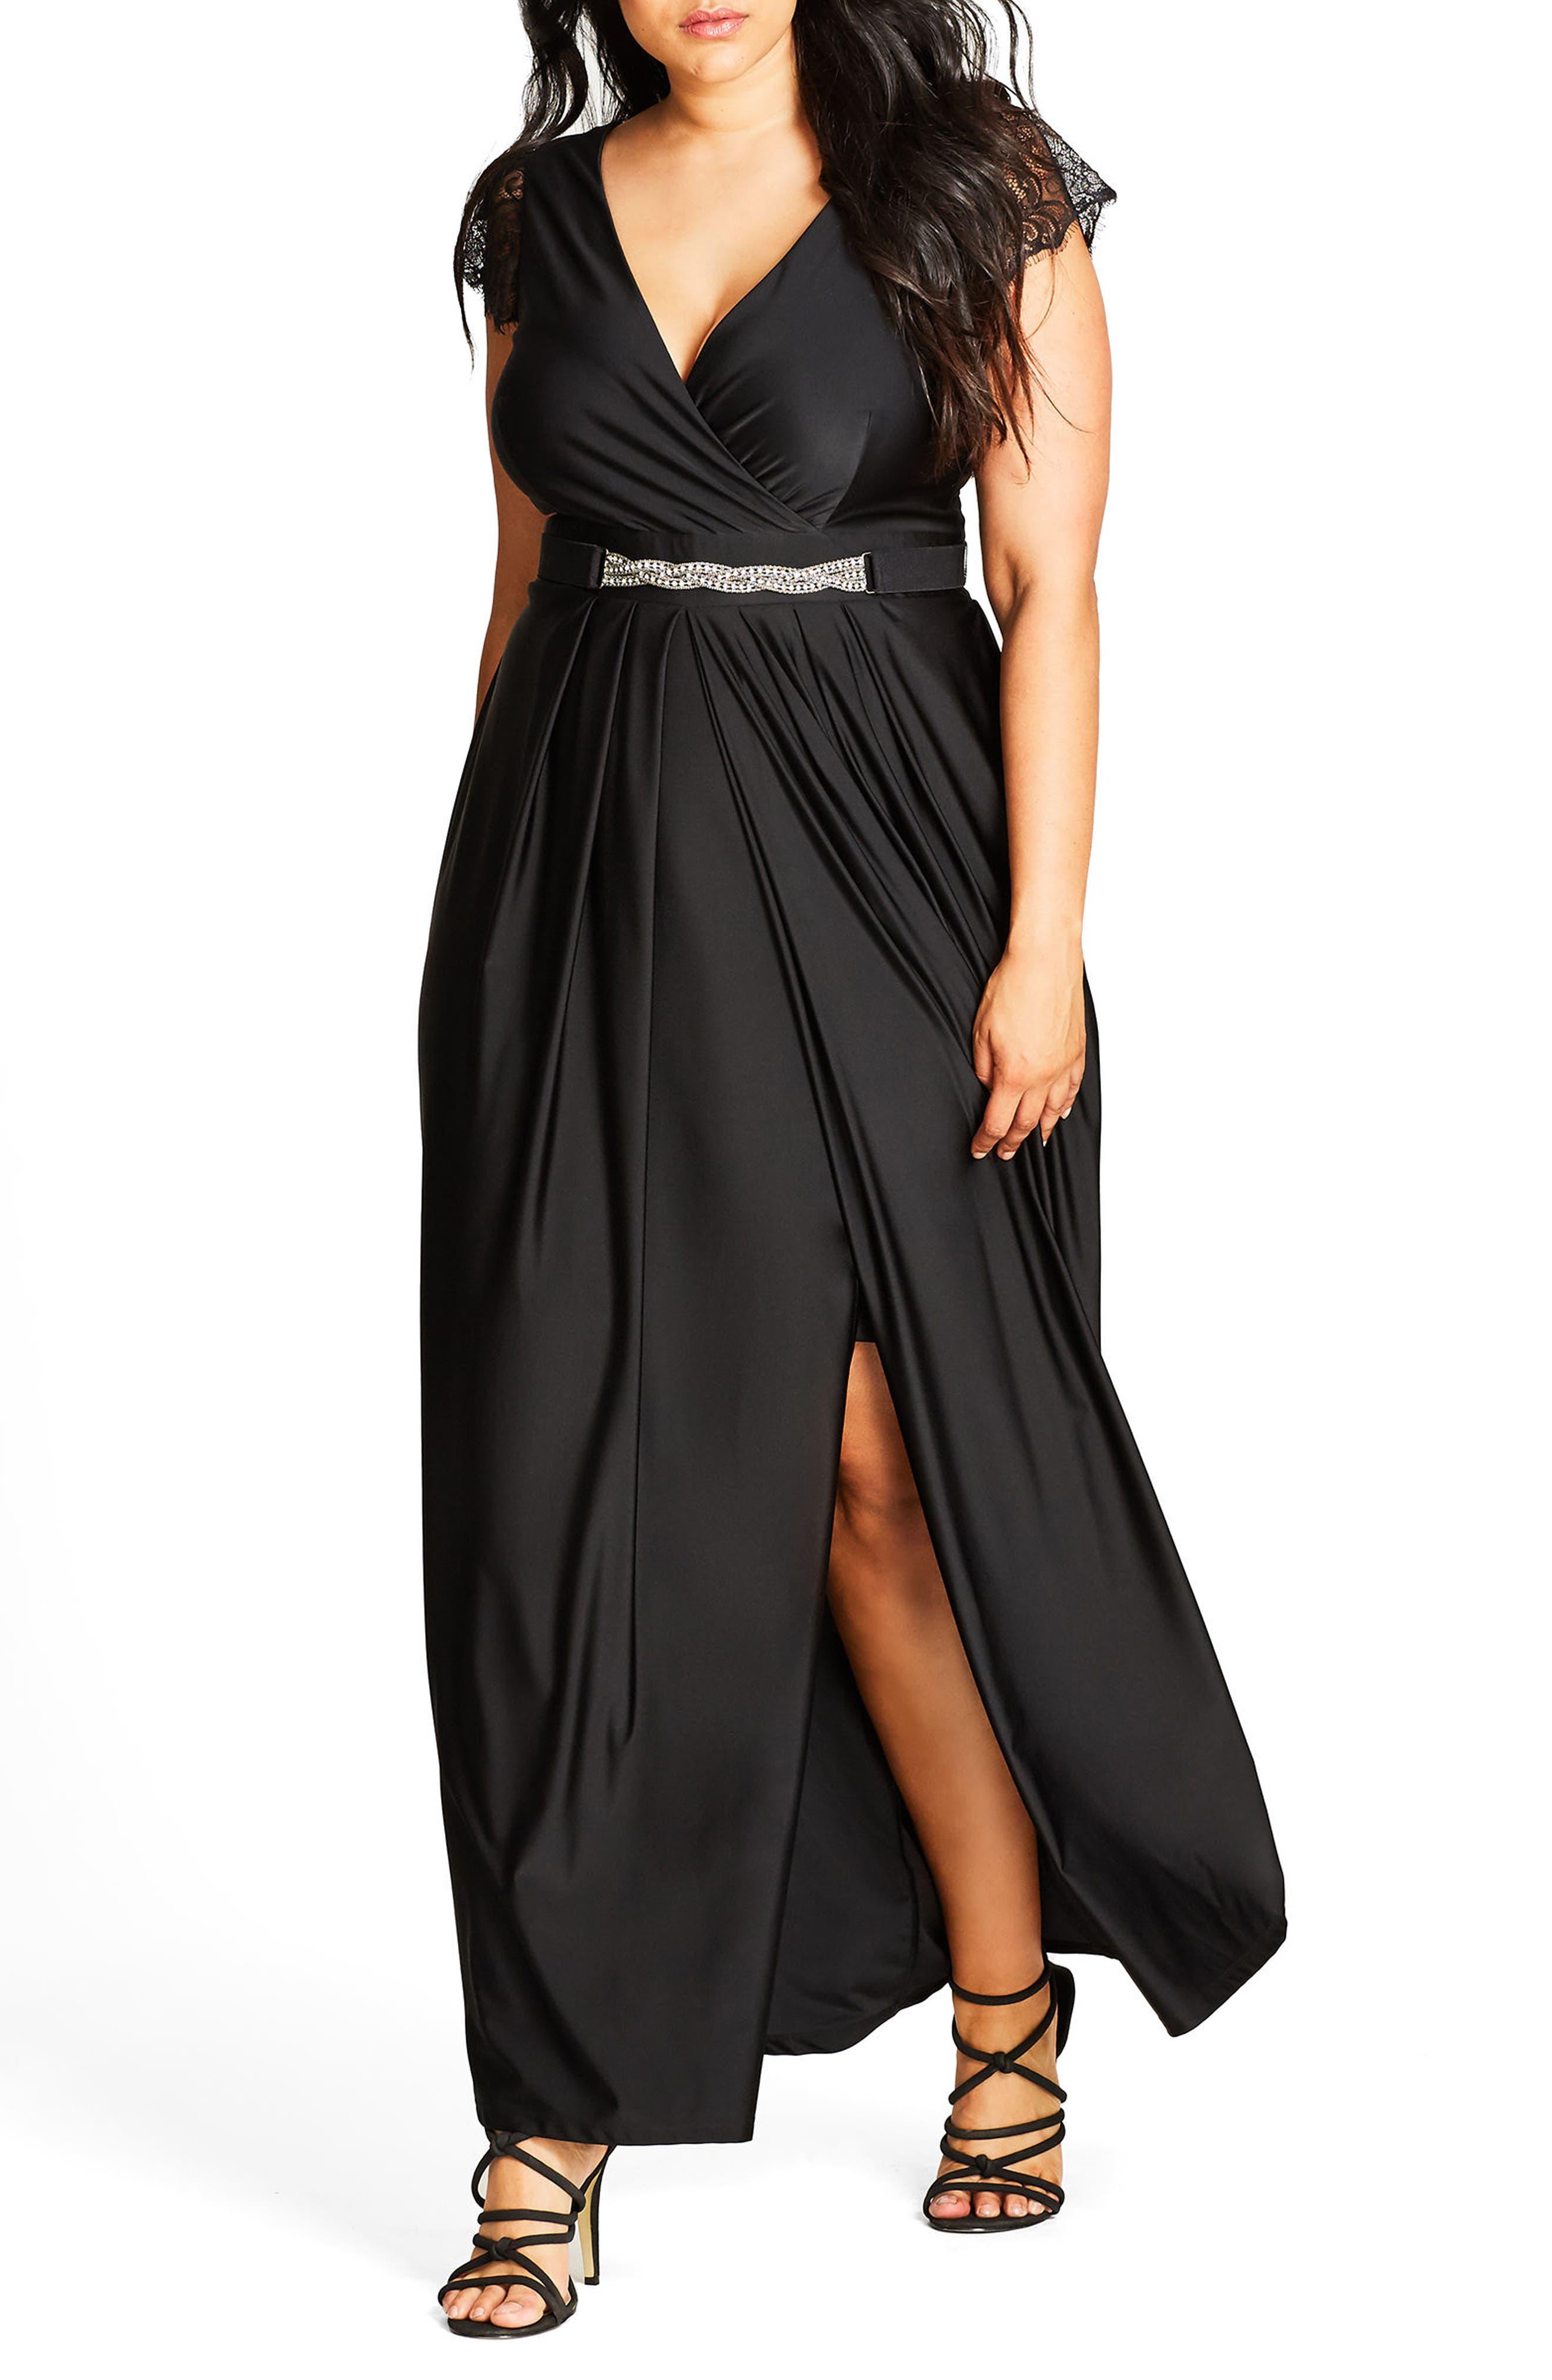 Plus Size City Chic Flirty Drape Maxi Dress